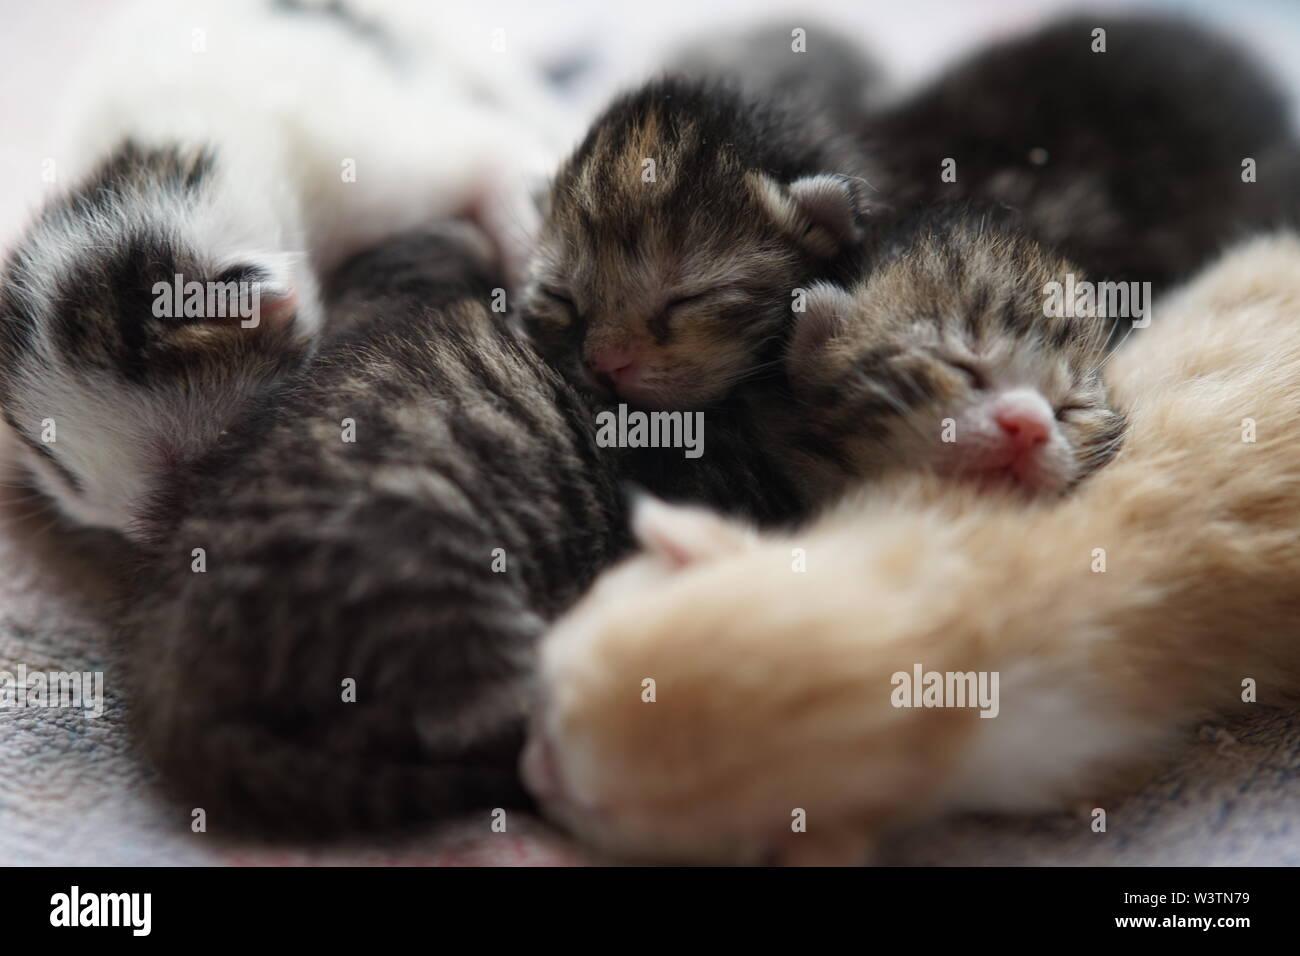 Cute newborn kittens sleeping, baby animals sleep, lovely family - Stock Image